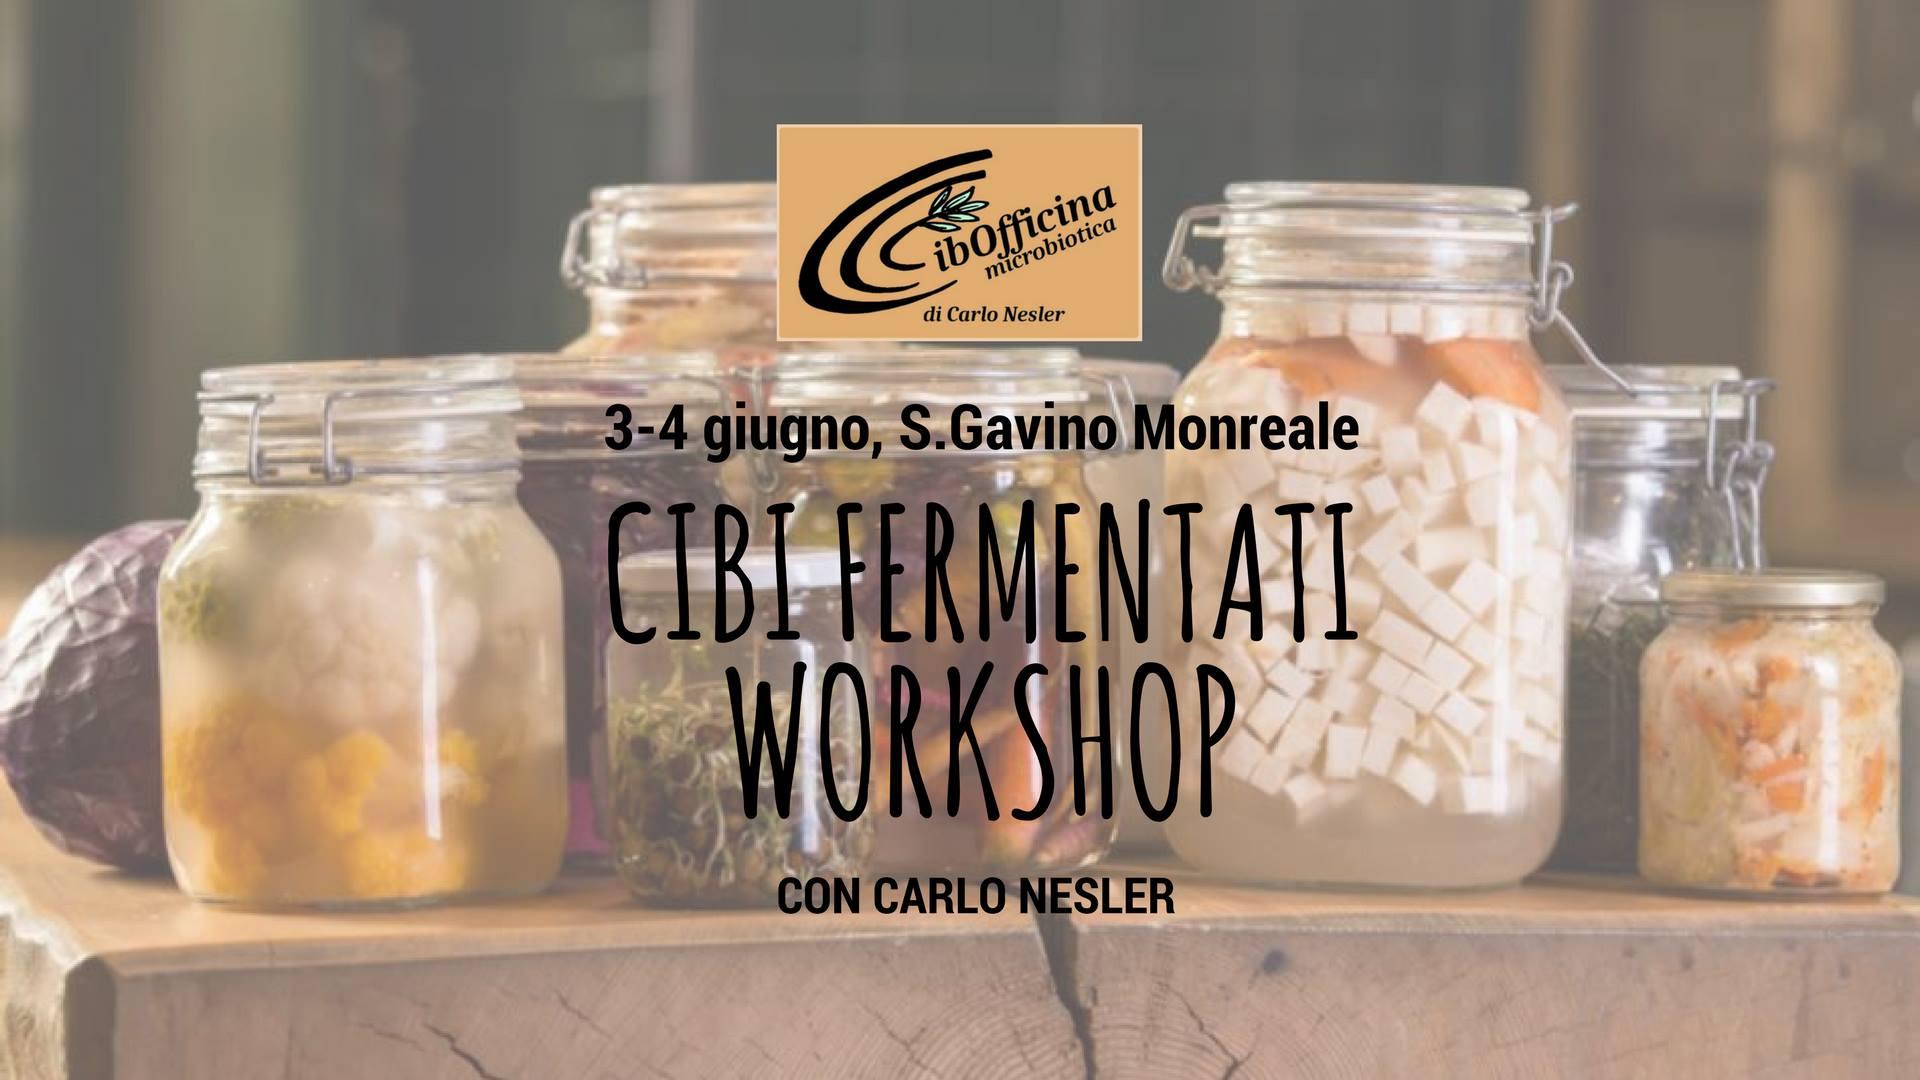 Cibi Fermentati - Workshop con Carlo Nesler